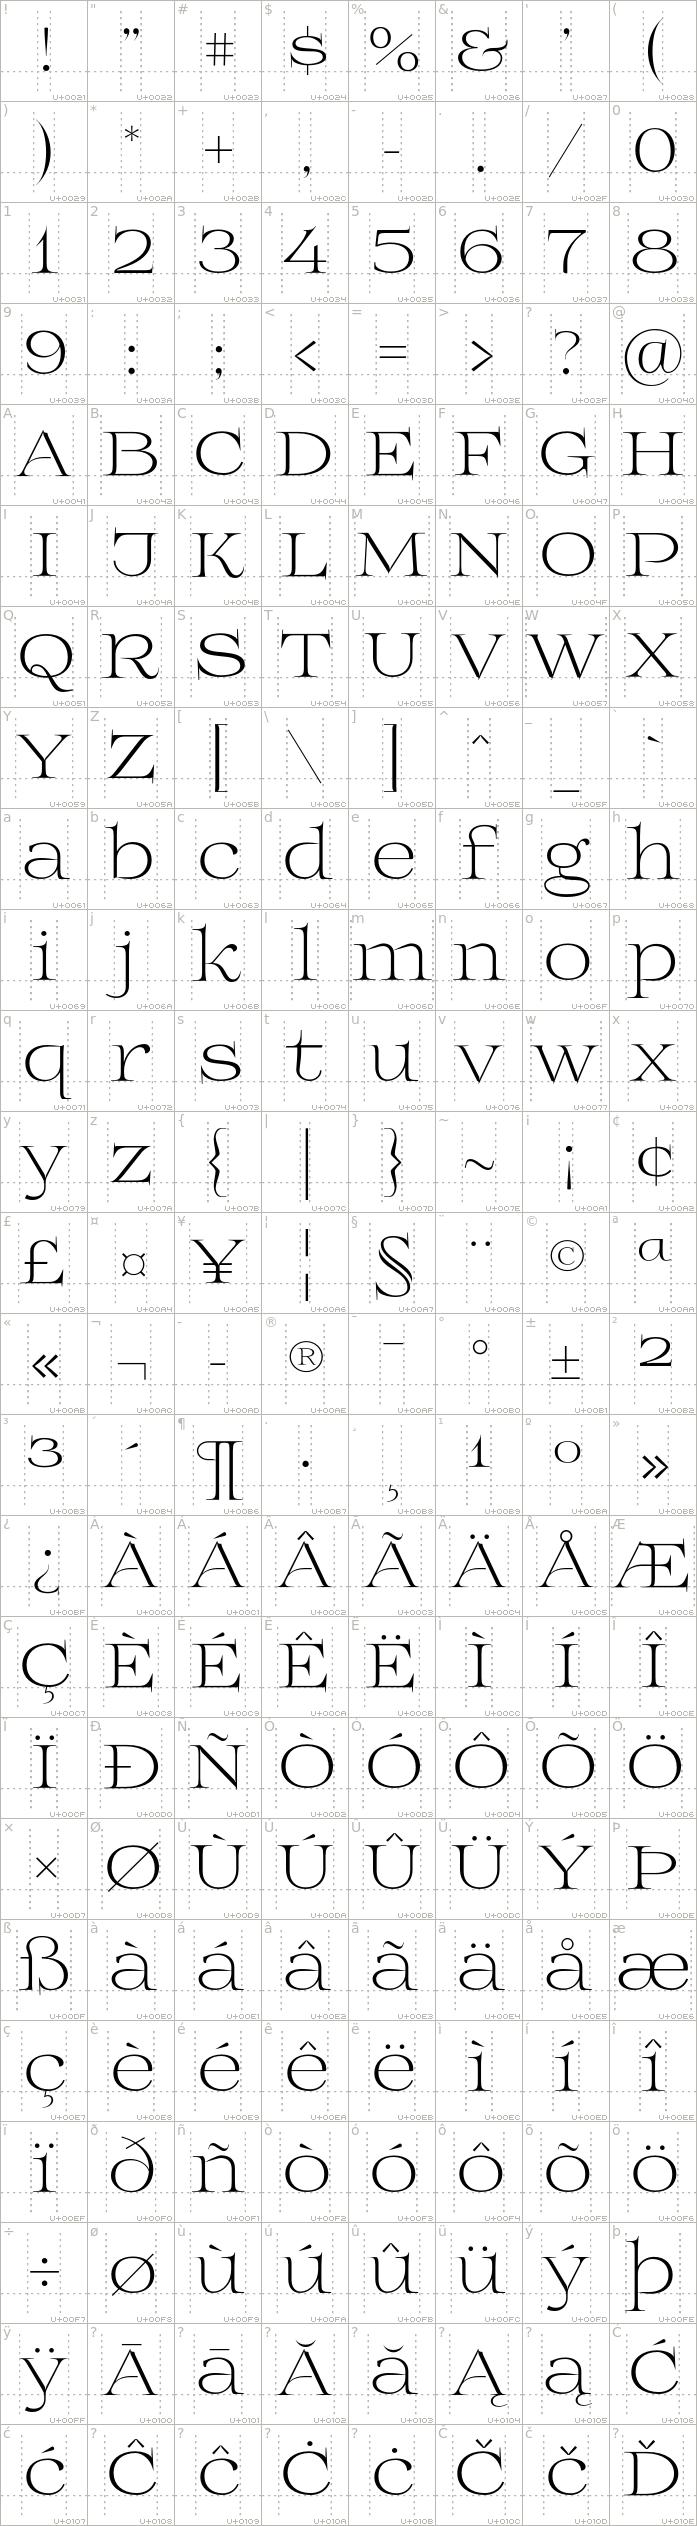 prida01.light.character-map-1